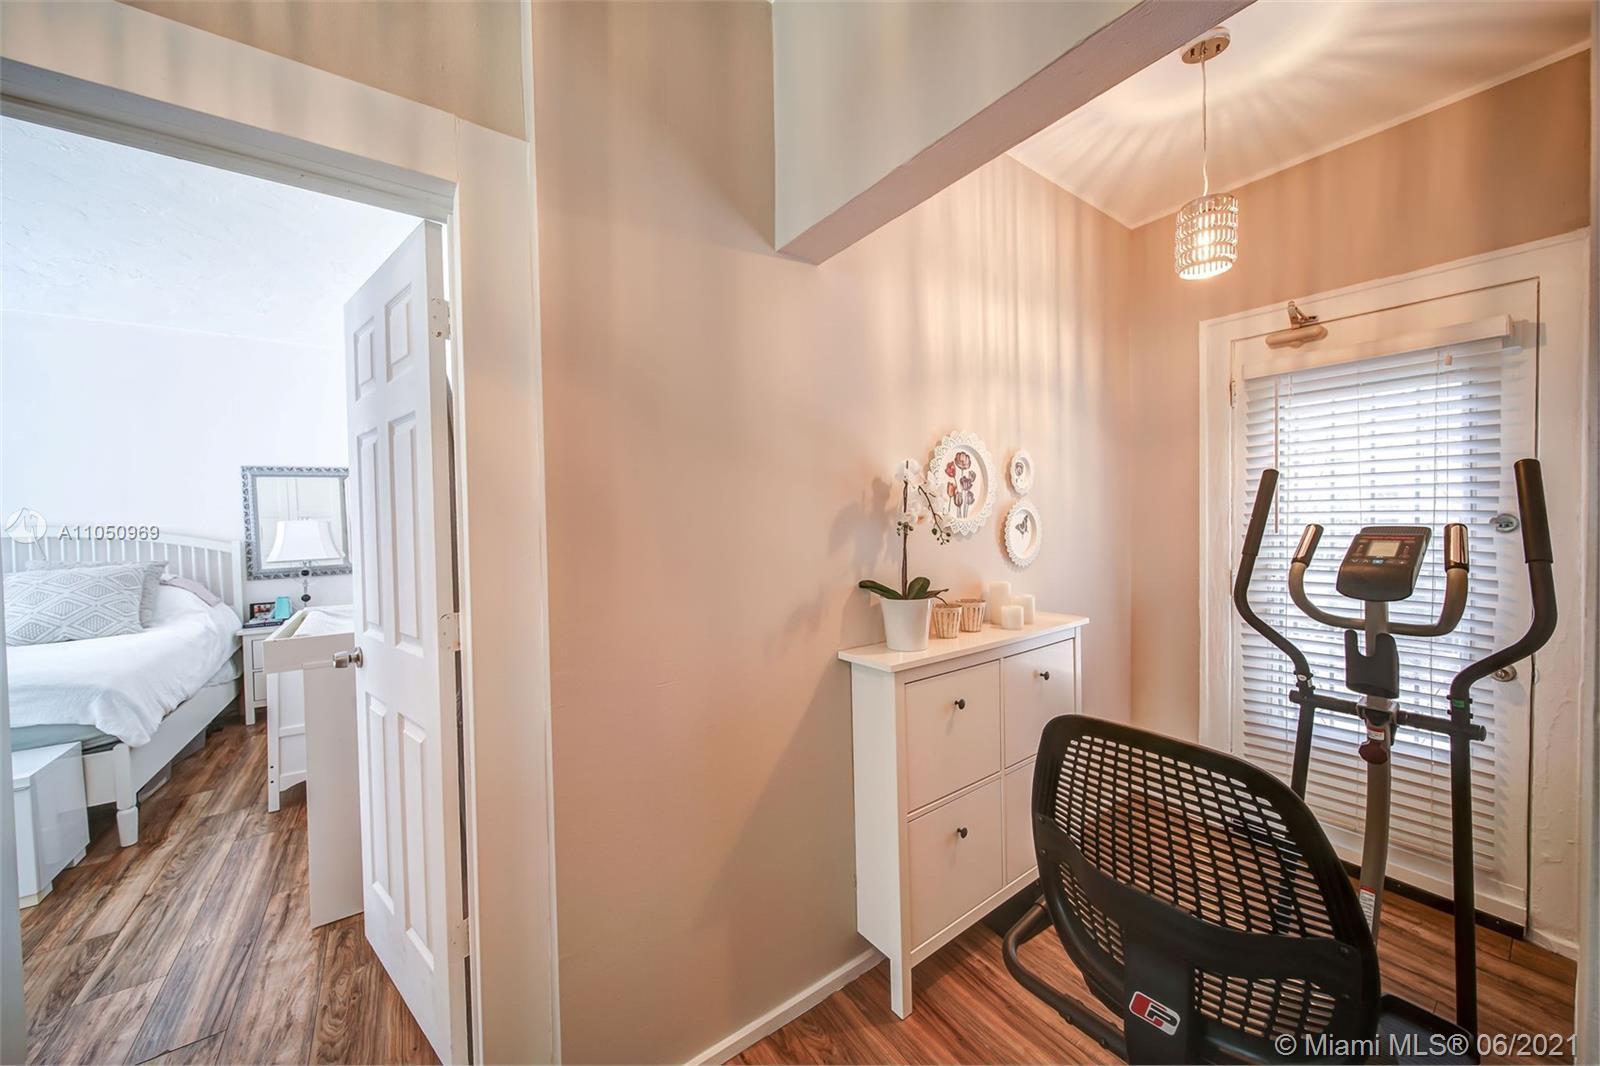 /  3581 sq. ft. $ 2021-06-02 0 Photo